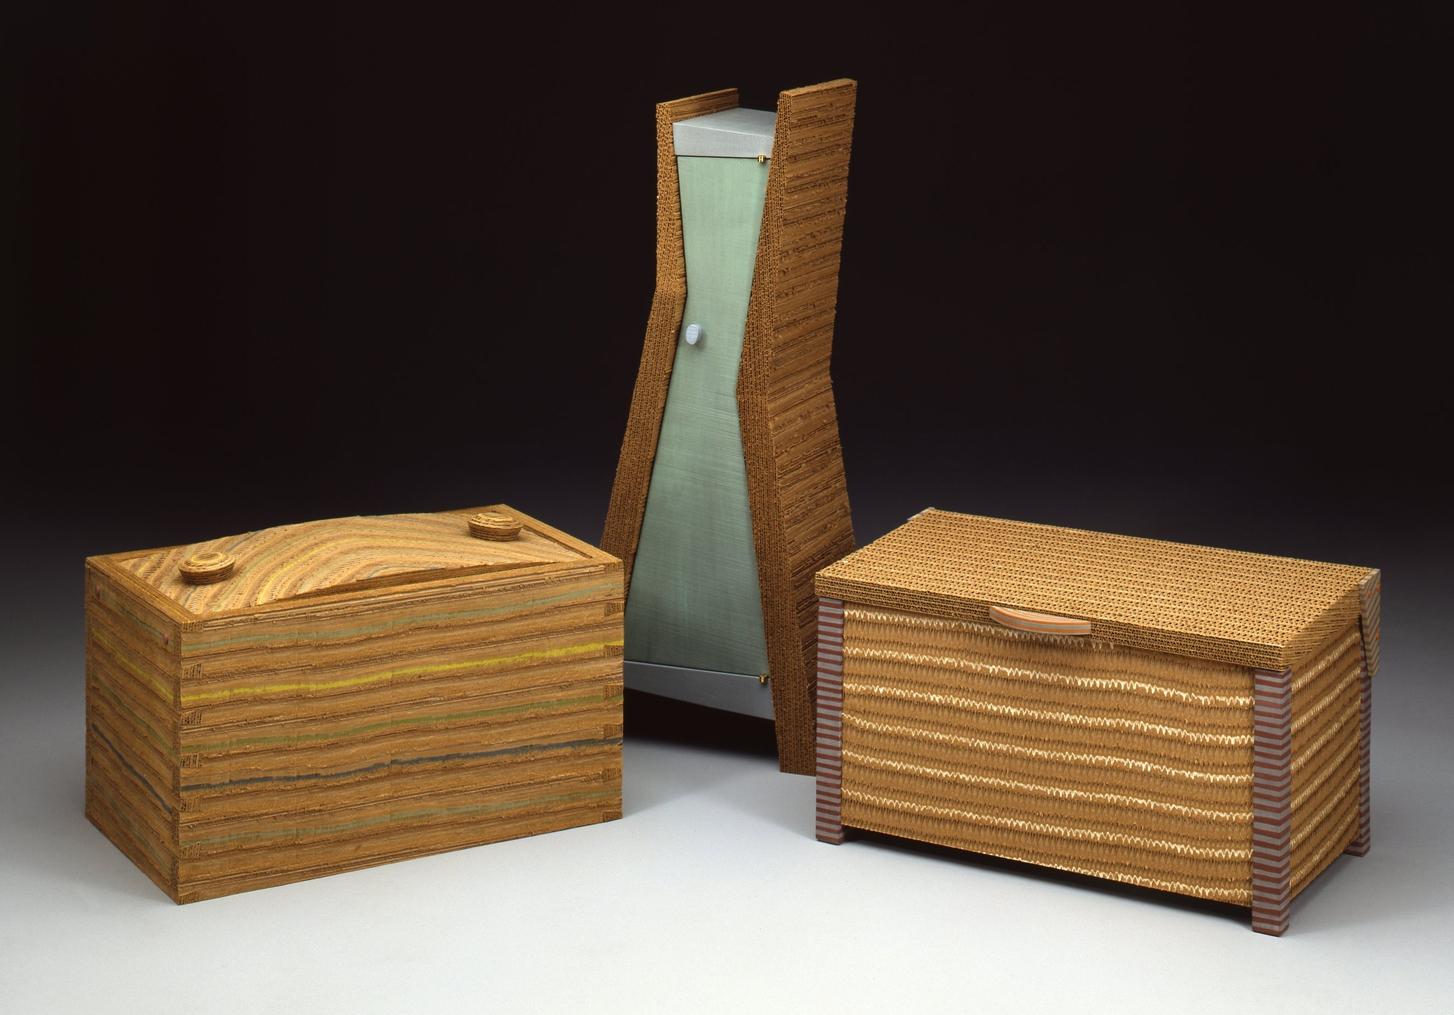 (left to right) Dovetail Box I 1990 I corrugated paper I 15 x 23 x 14    Zig Zag Cabinet I 1992 I corrugated paper, wood, paint I 32 x 16 x 10     Lidded Chest I 1990 I corrugated paper, wood, paint I 14 x 24 x 14